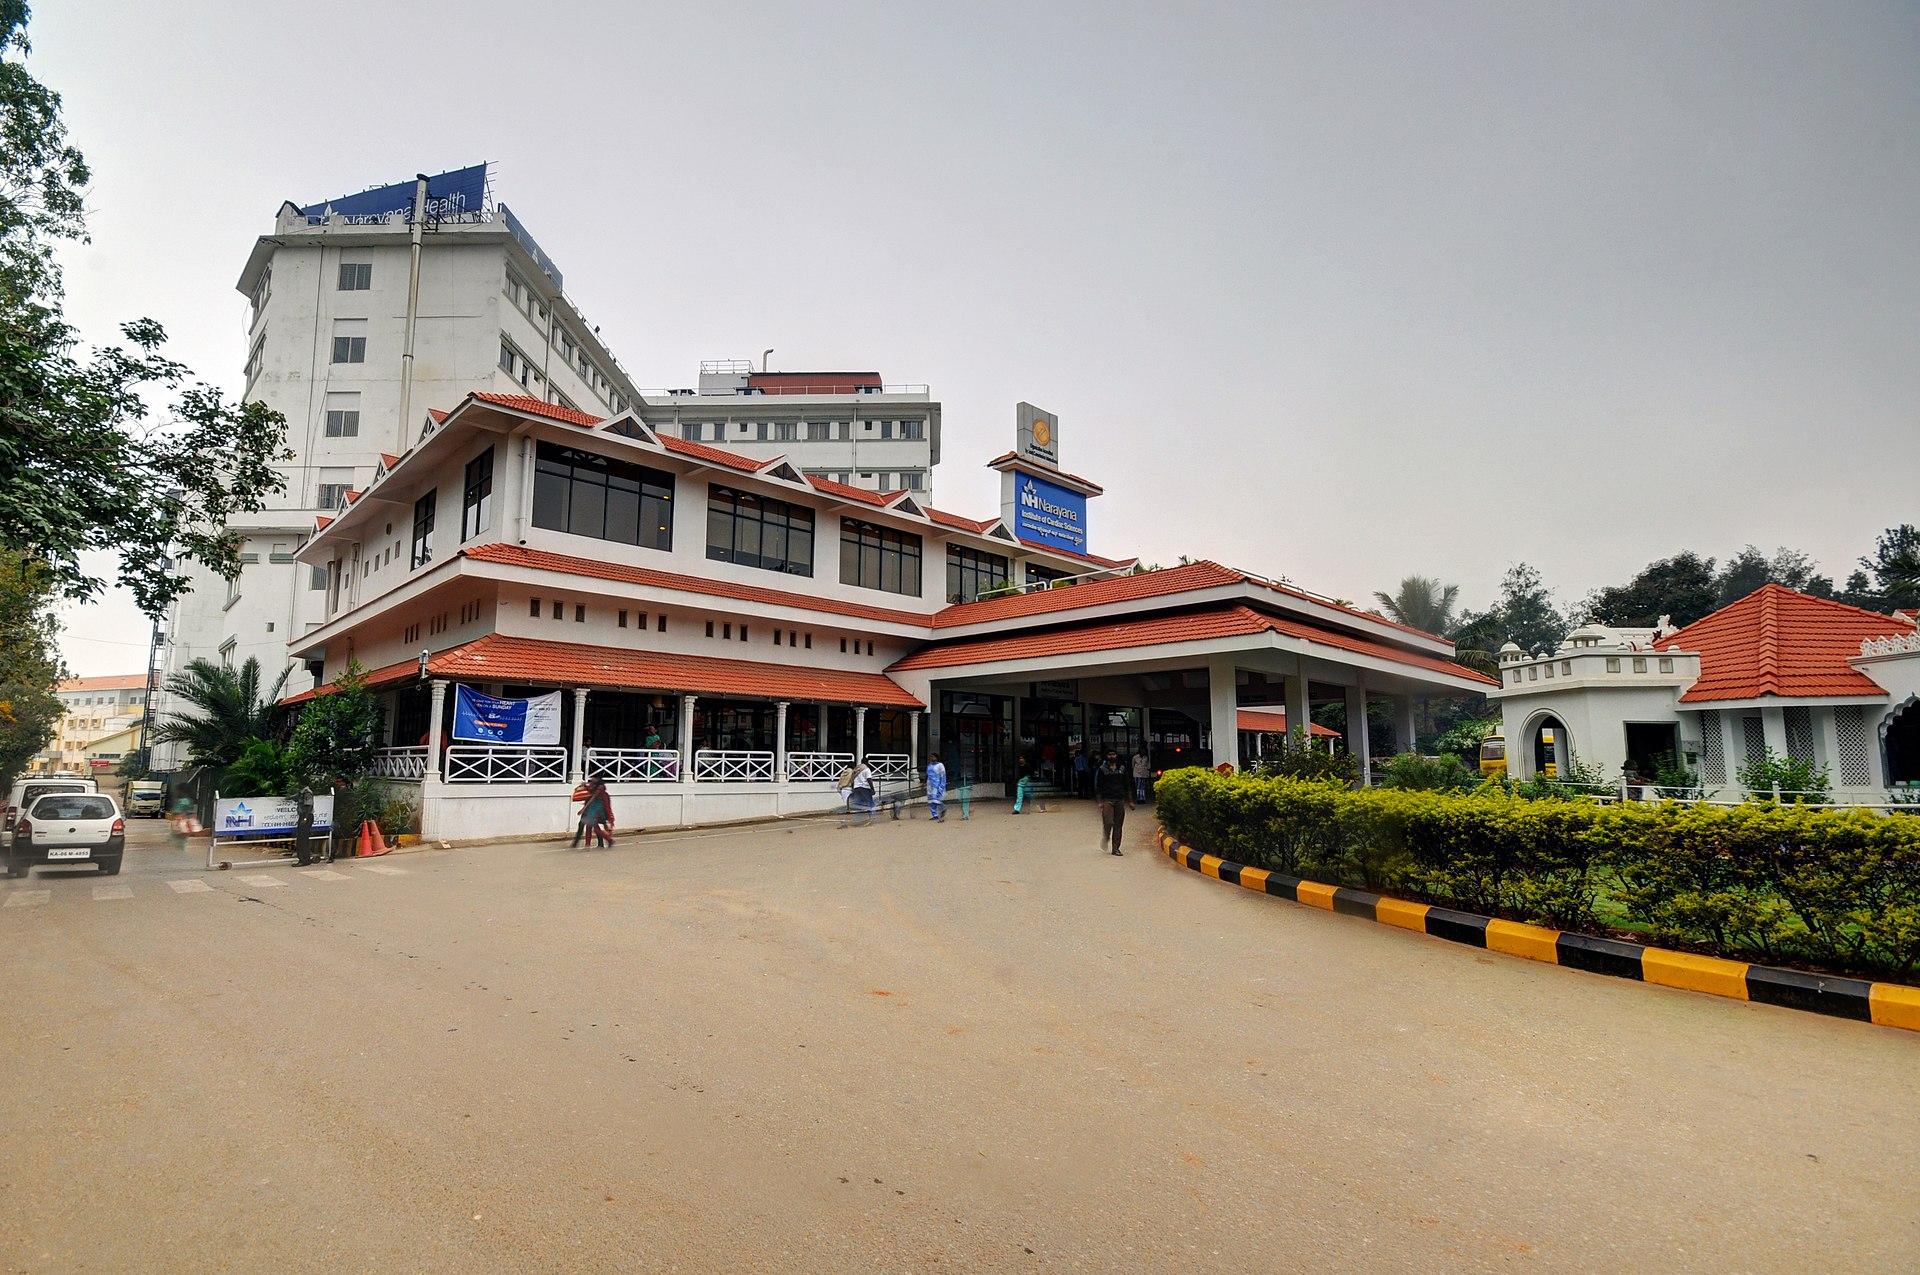 narayana hrudalaya India's well-known multi-specialty hospital chain narayana hrudayalaya (nh) is all set to buy newrise healthcare pvt ltd, a subsidiary of panacea biotec ltd, in a rs 180-crore deal.